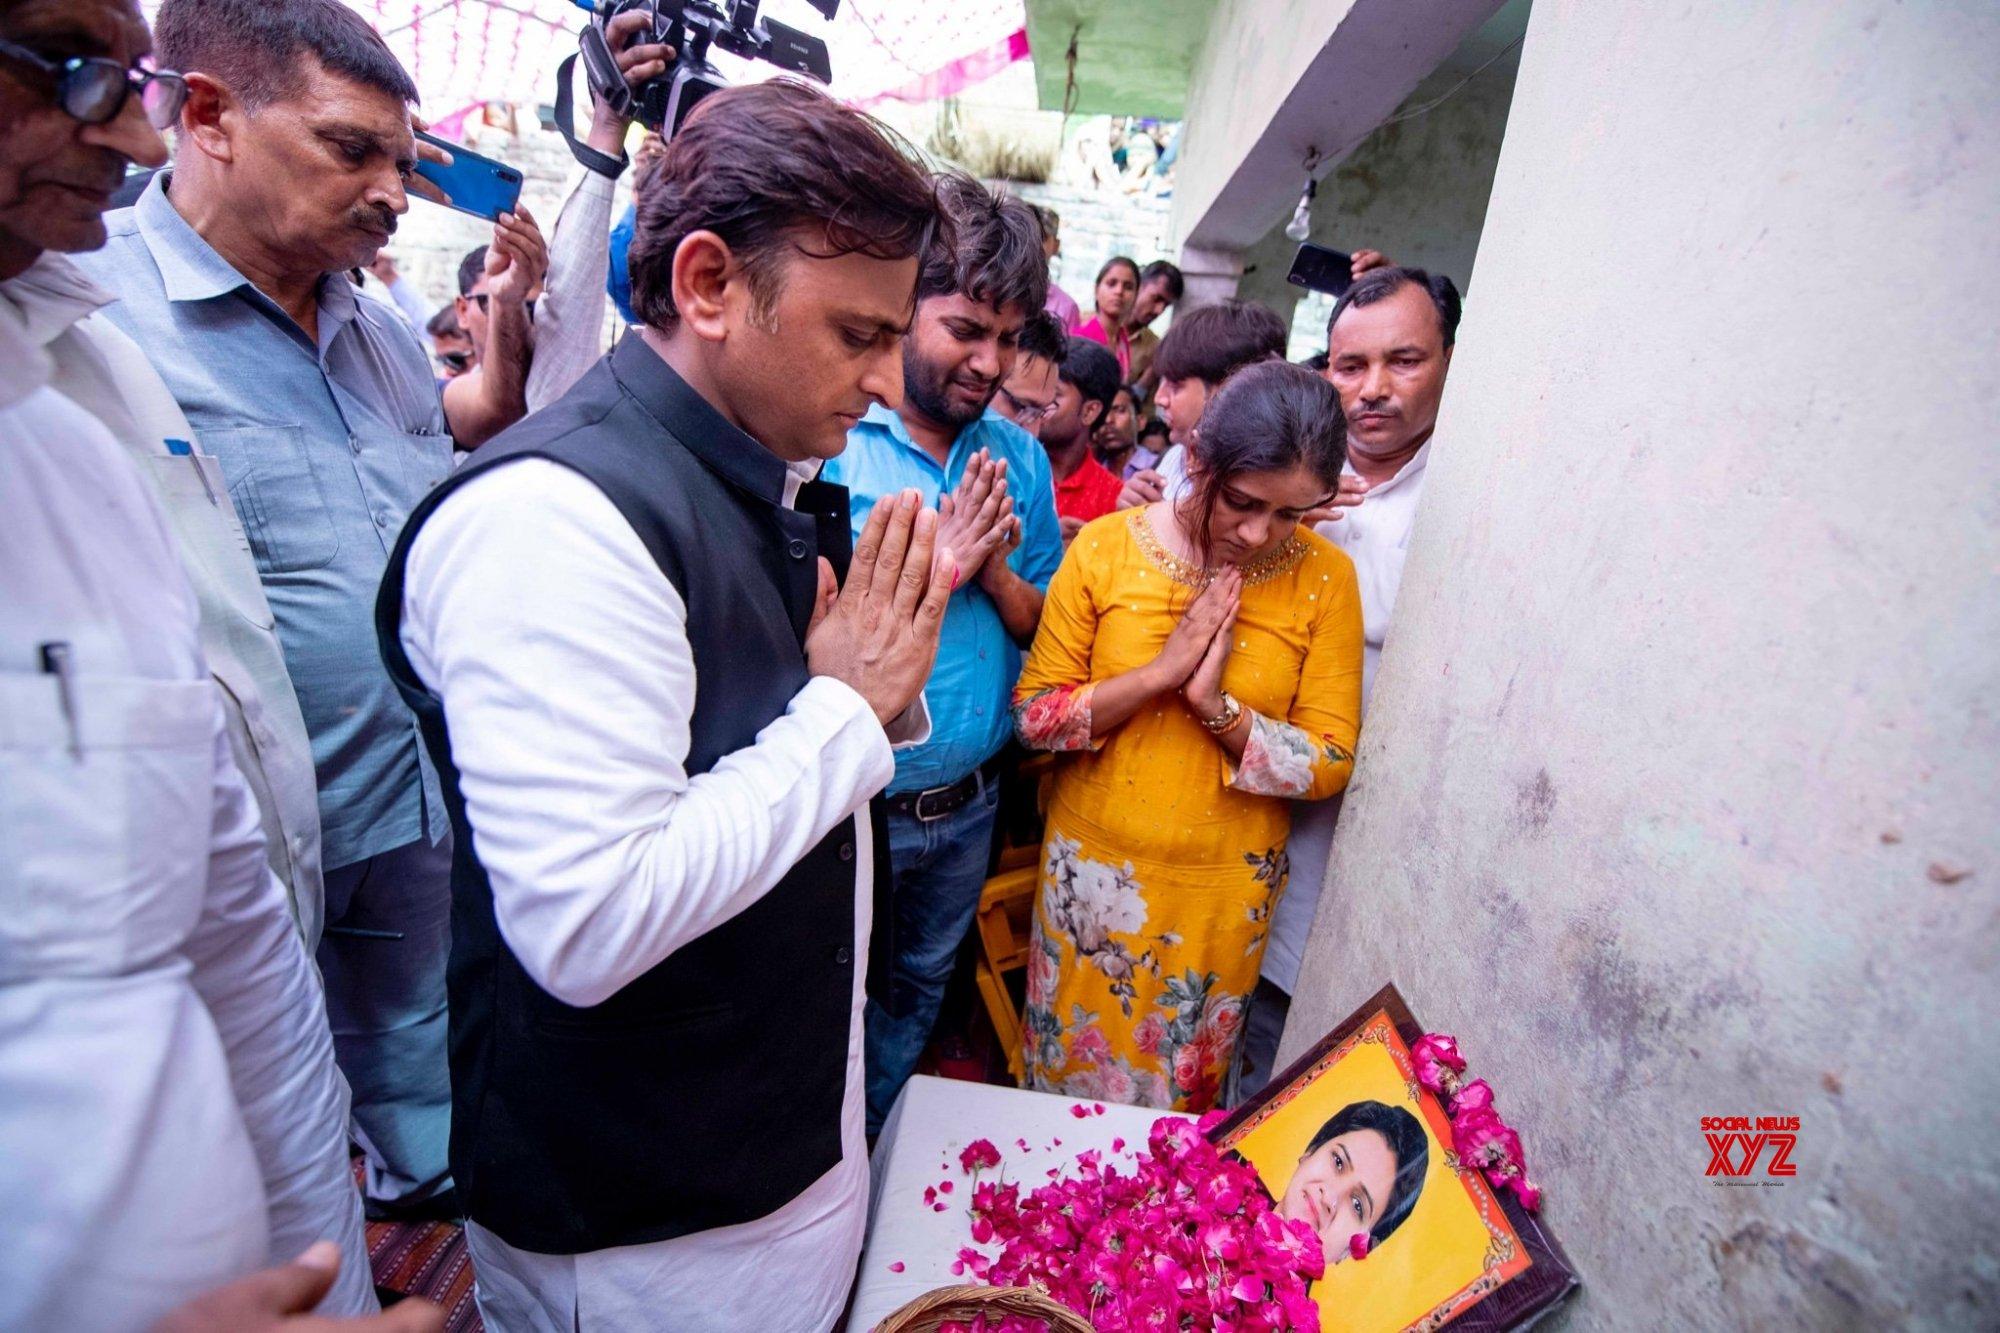 Etah (UP): Akhilesh Yadav reaches Etah to pay tributes to murdered UP Bar Council chief #Gallery